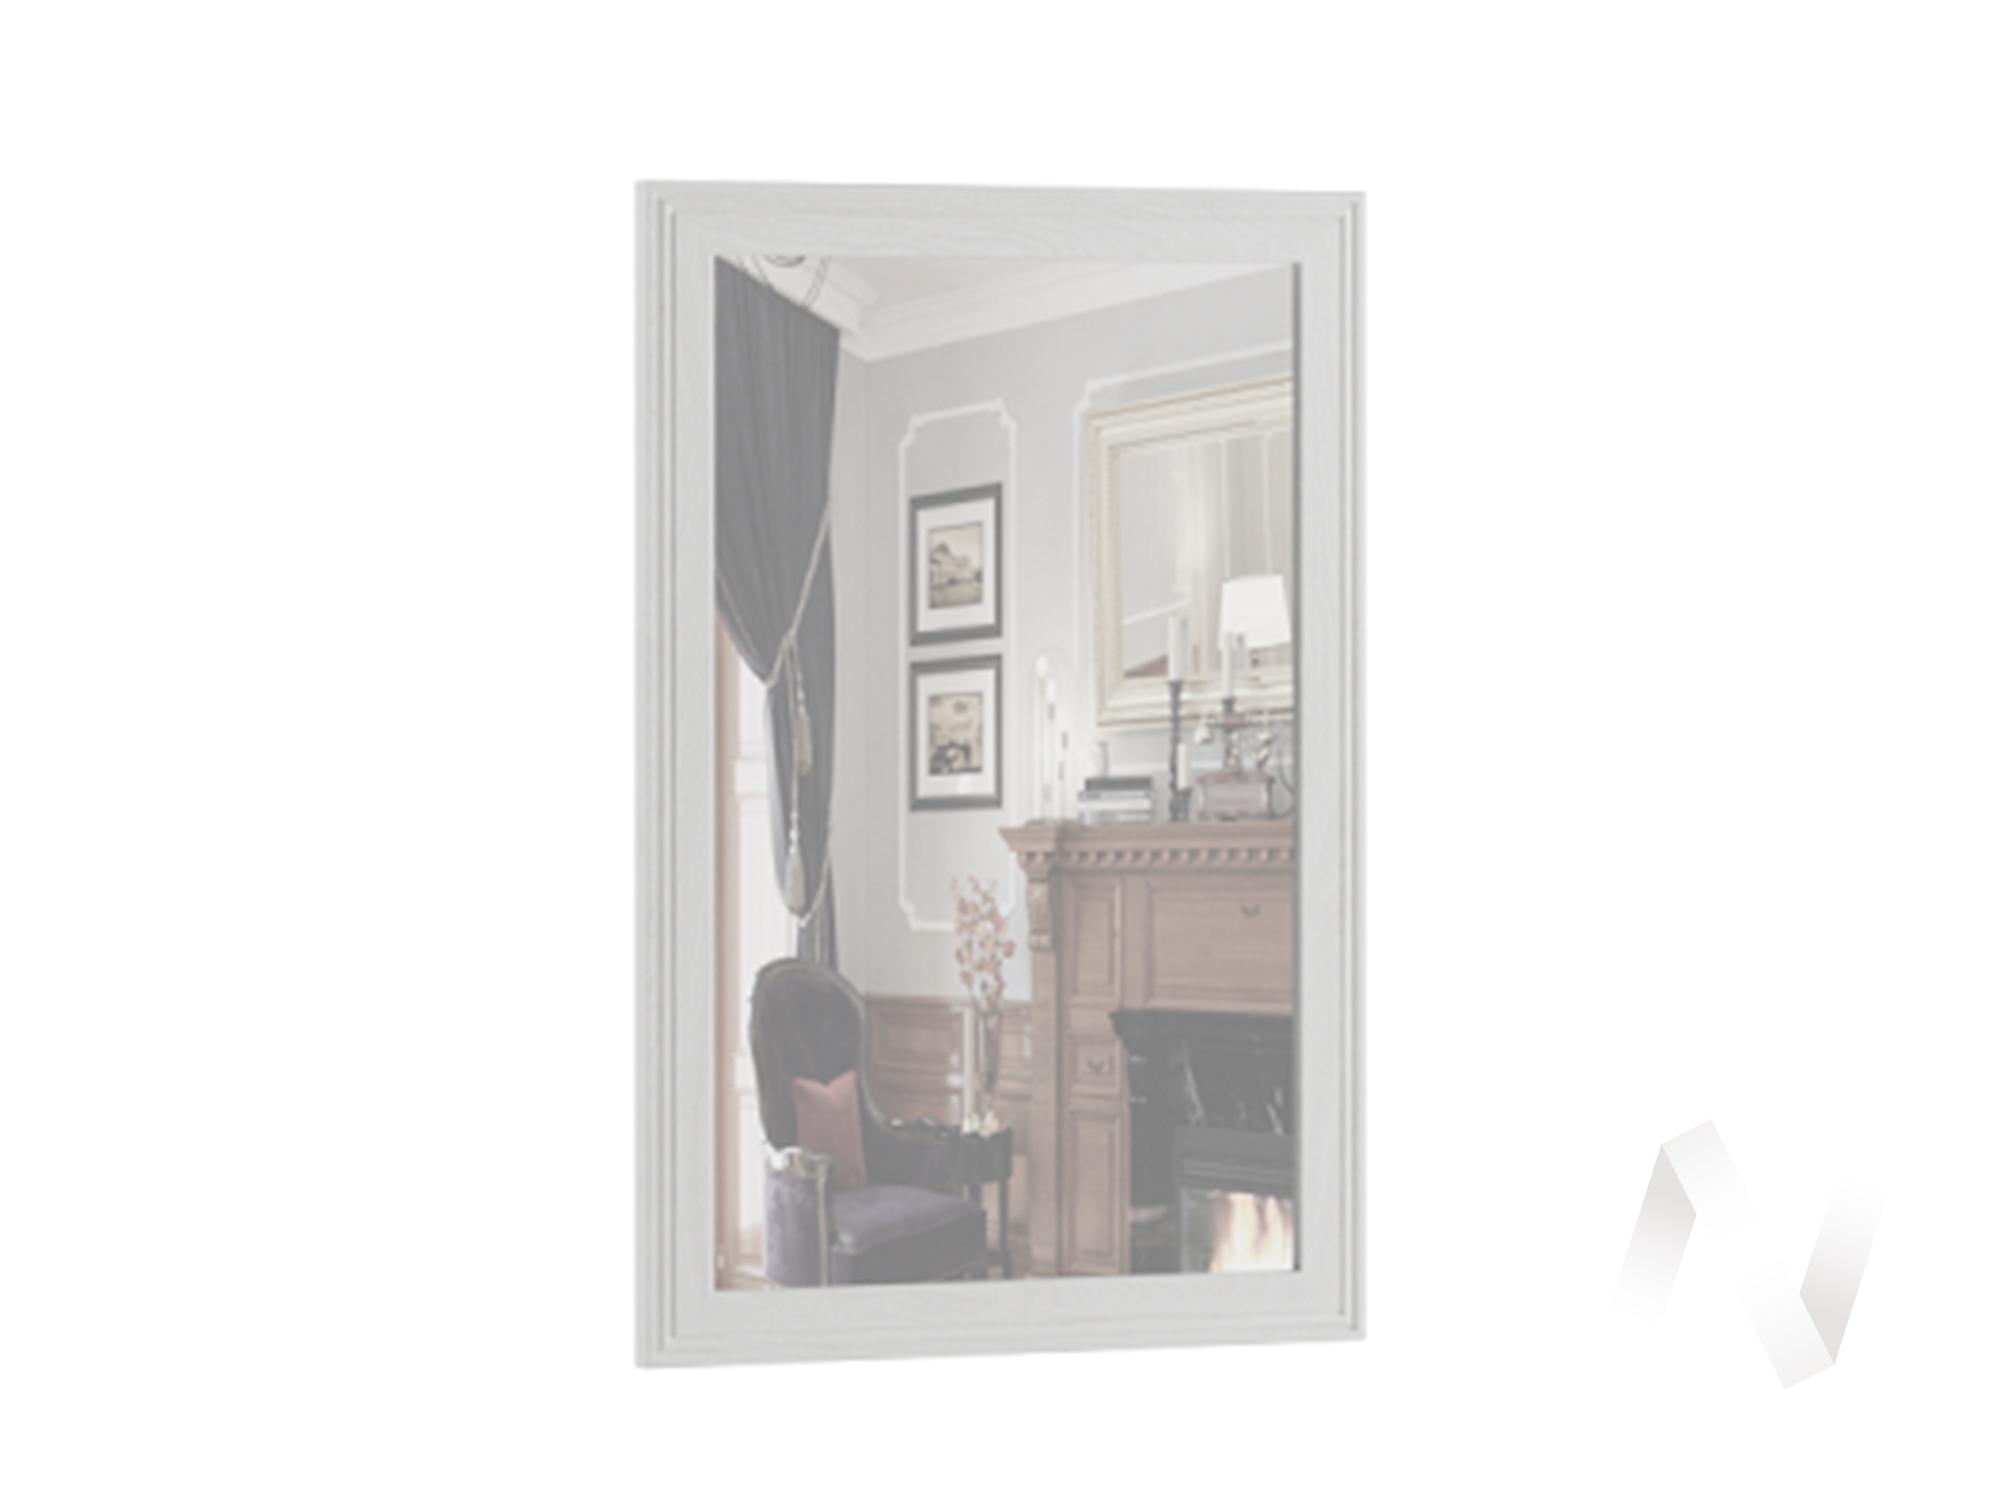 Зеркало навесное РЗ-20 Спальня Ричард (ясень анкор светлый)